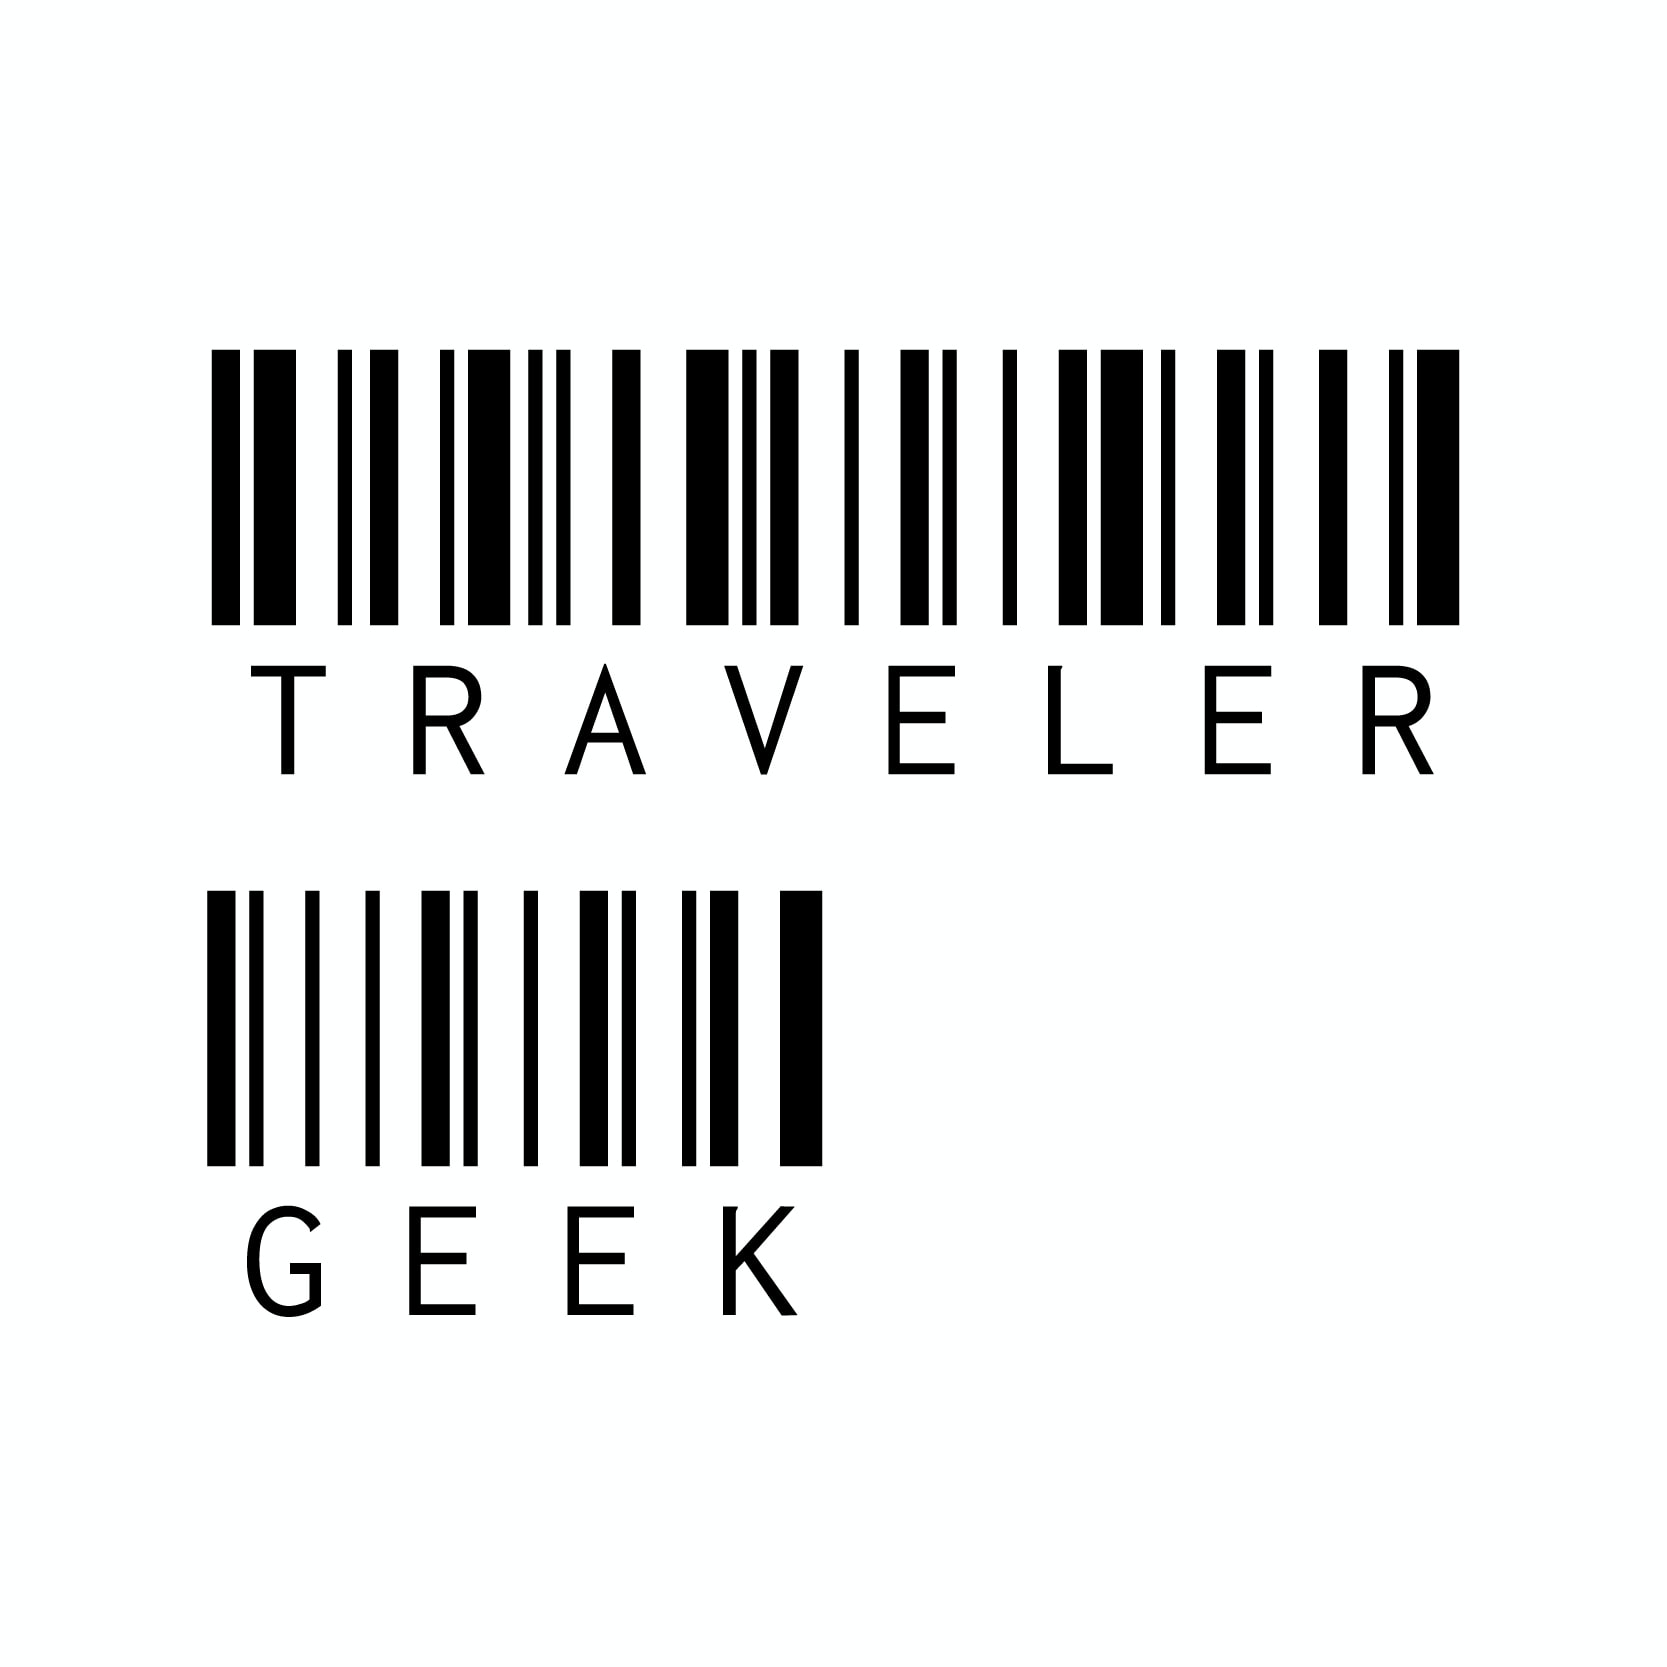 Go to TRΛVELER .'s profile